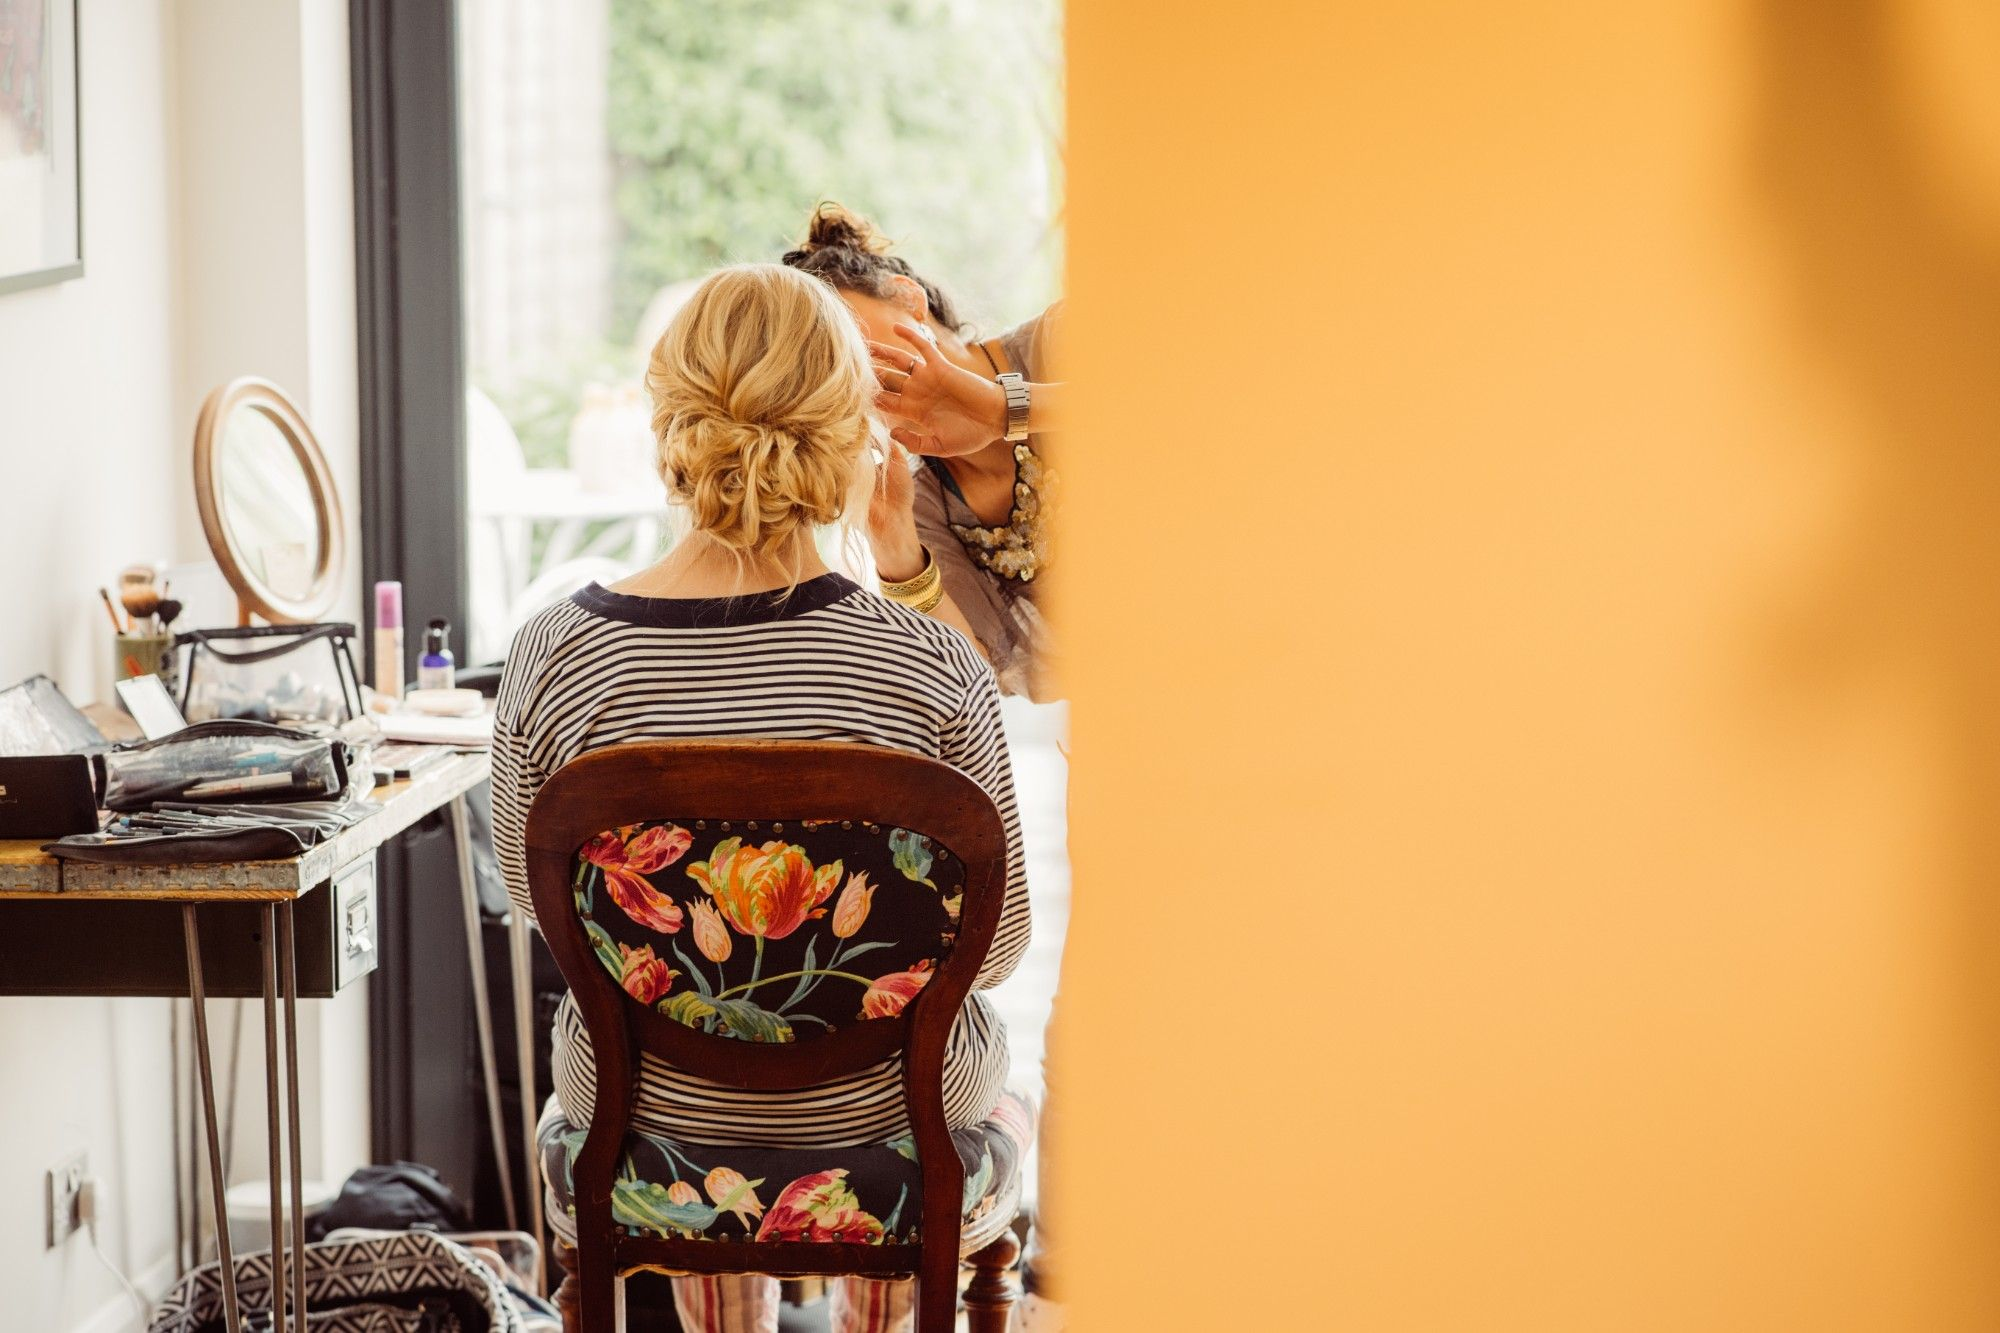 Bridal-wedding-hair-stylist-Tetbury-Gloucestershire-UK-LL-9